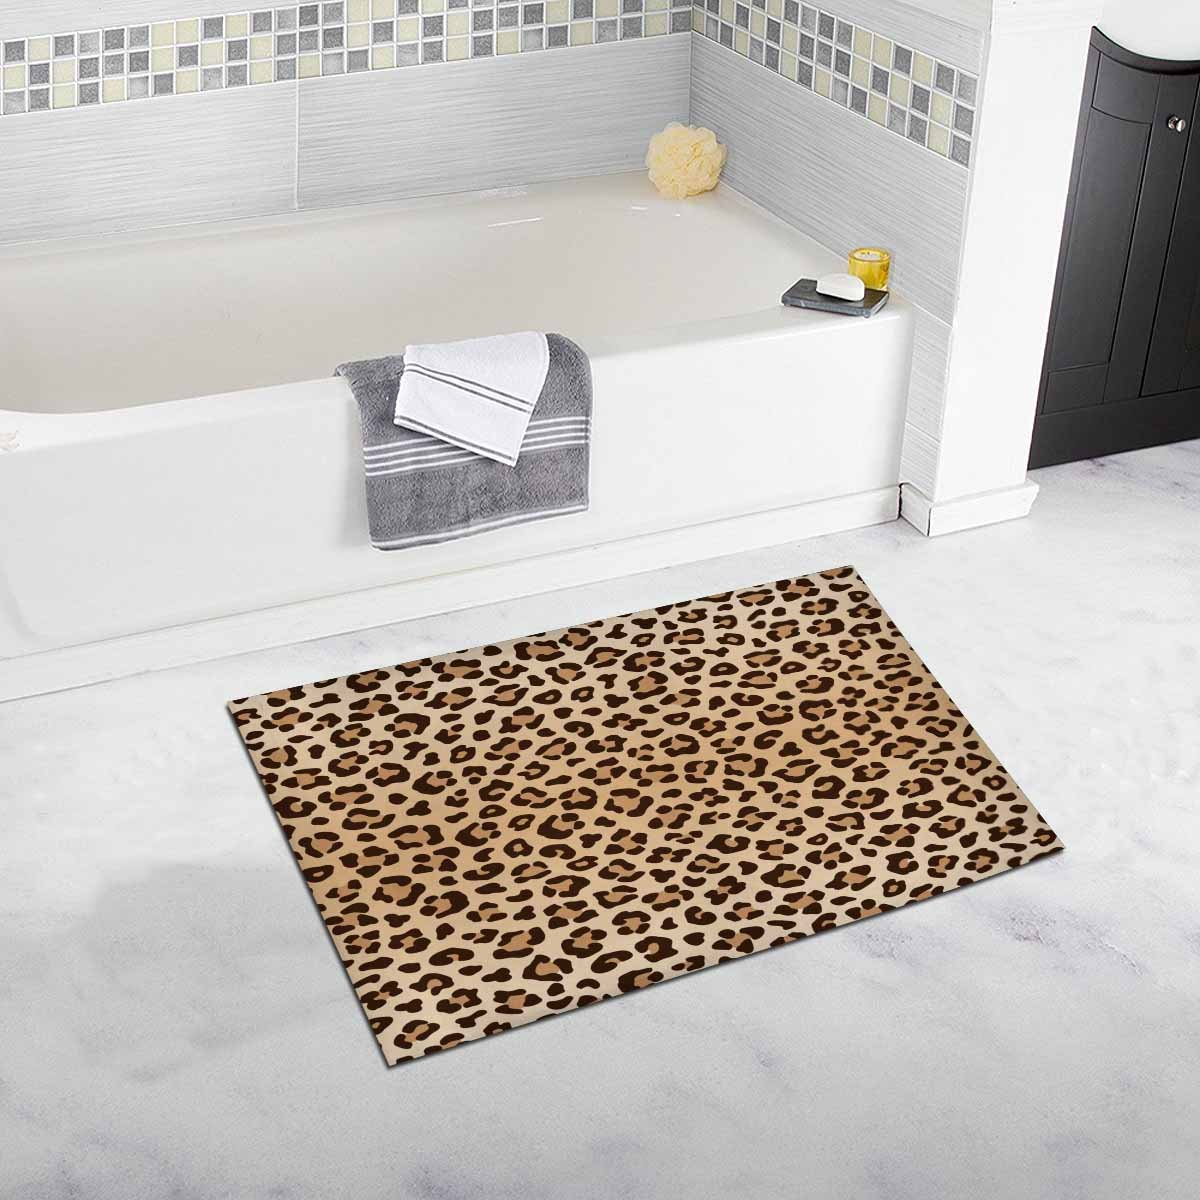 InterestPrint Leopard Animal Print Non Slip Bathroom Mat Bath Rug, 20 W X 32 L Inches by InterestPrint